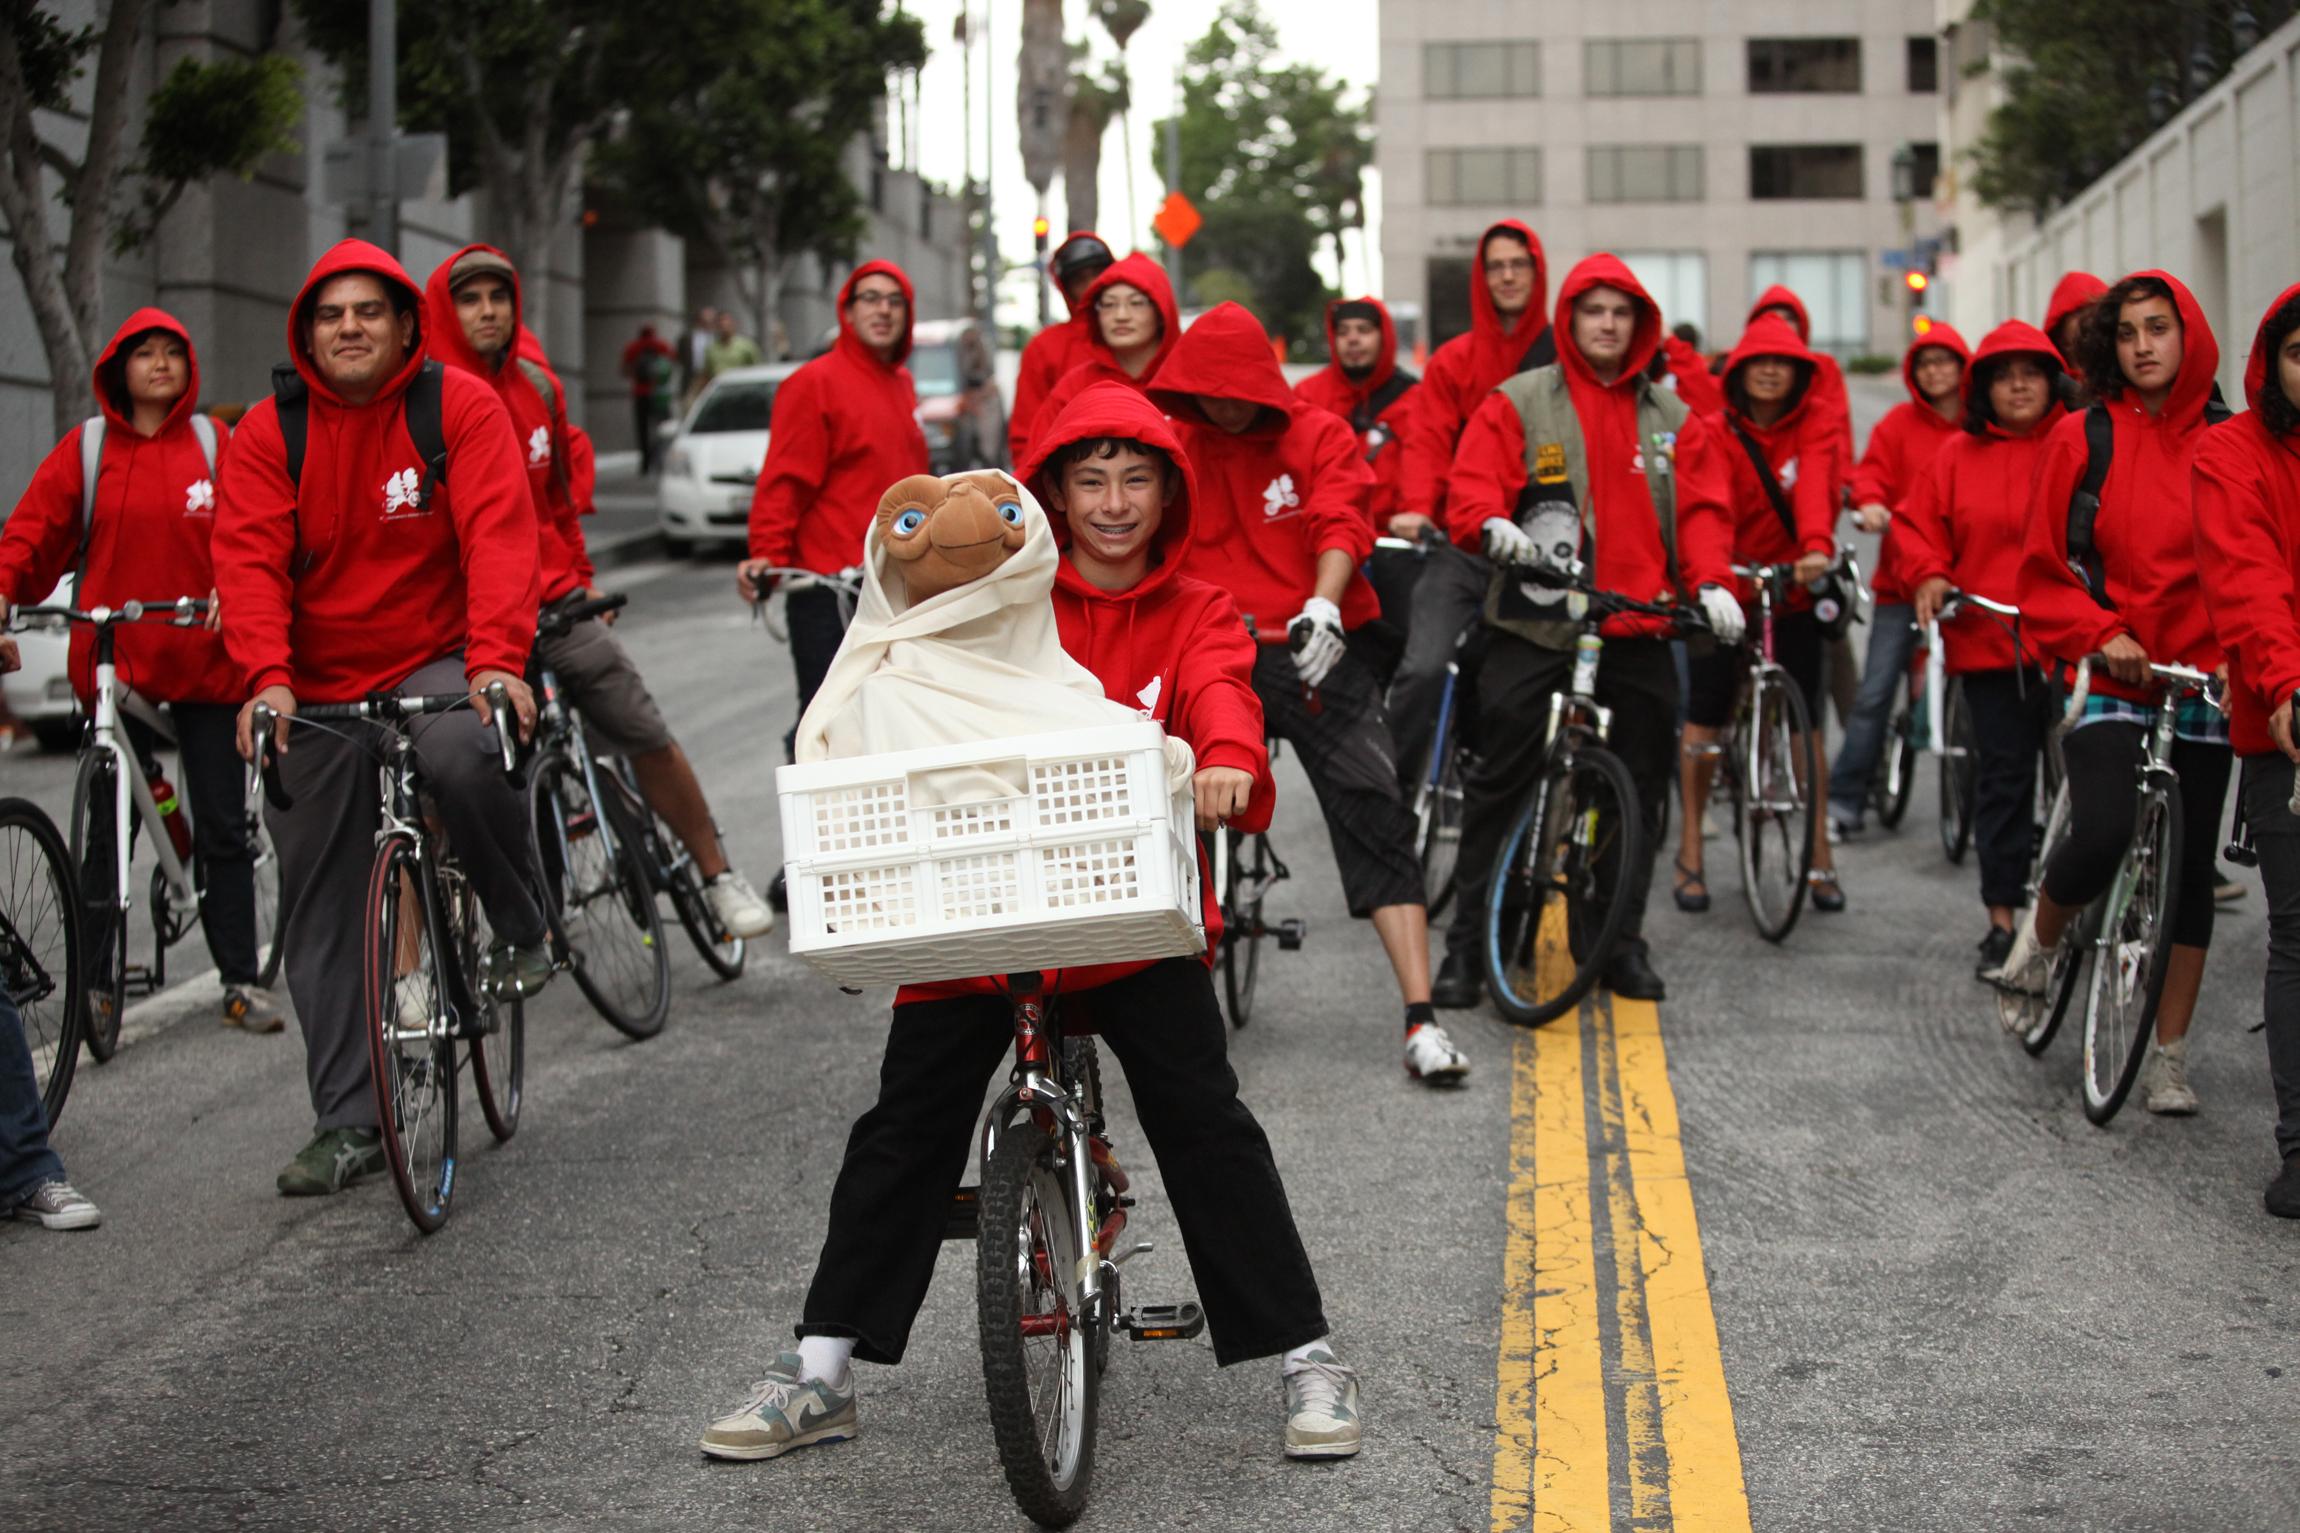 Fans Celebrate E.T. at LA Film Fest Outdoor Screening